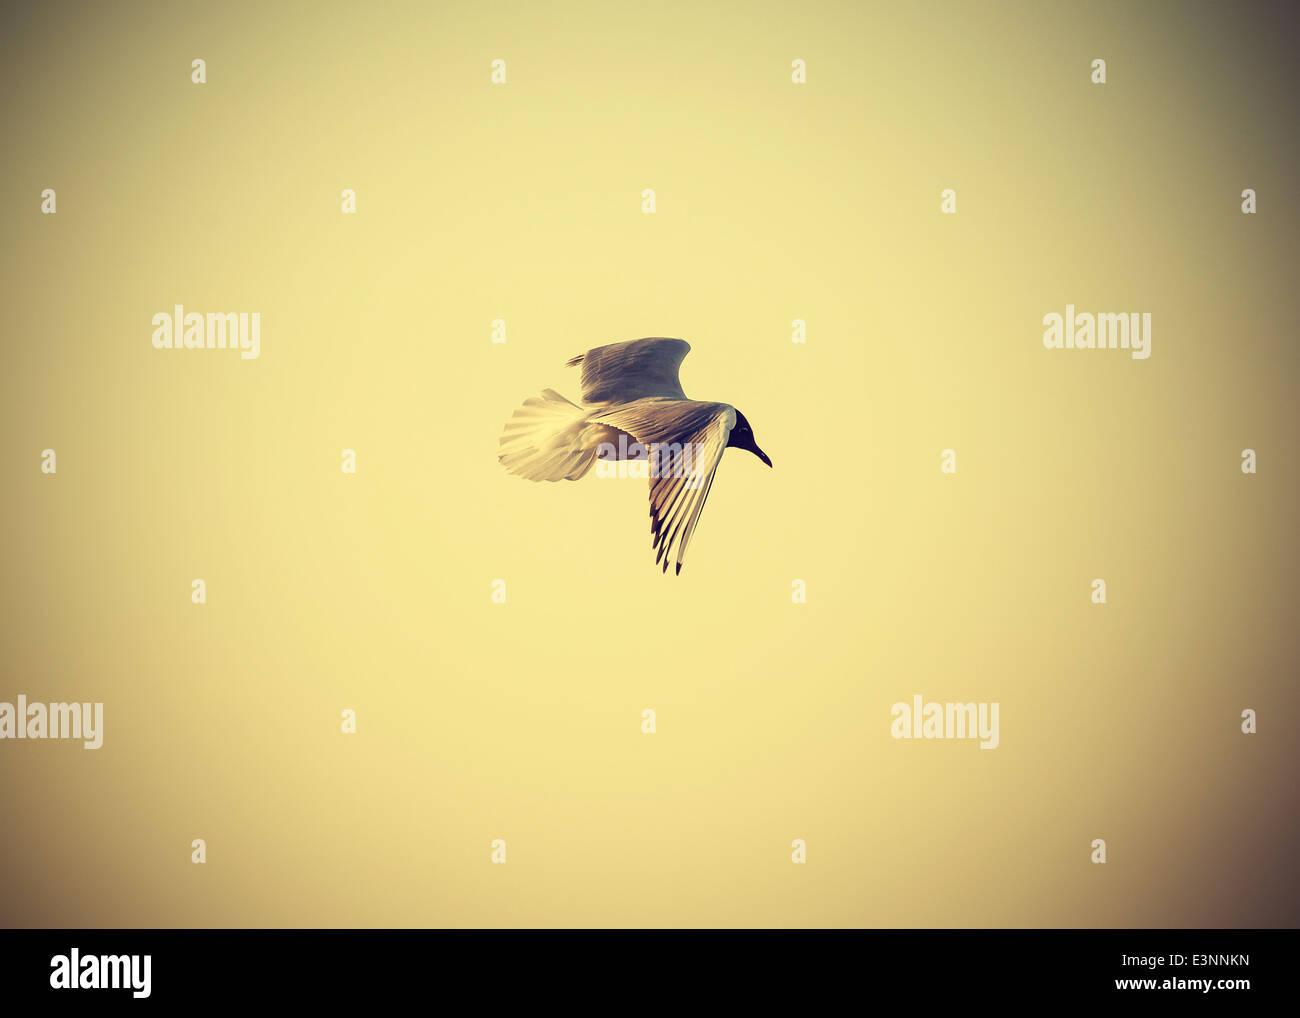 Gefilterte Vintage Retro Stil Vogel auf das Meer. Stockbild